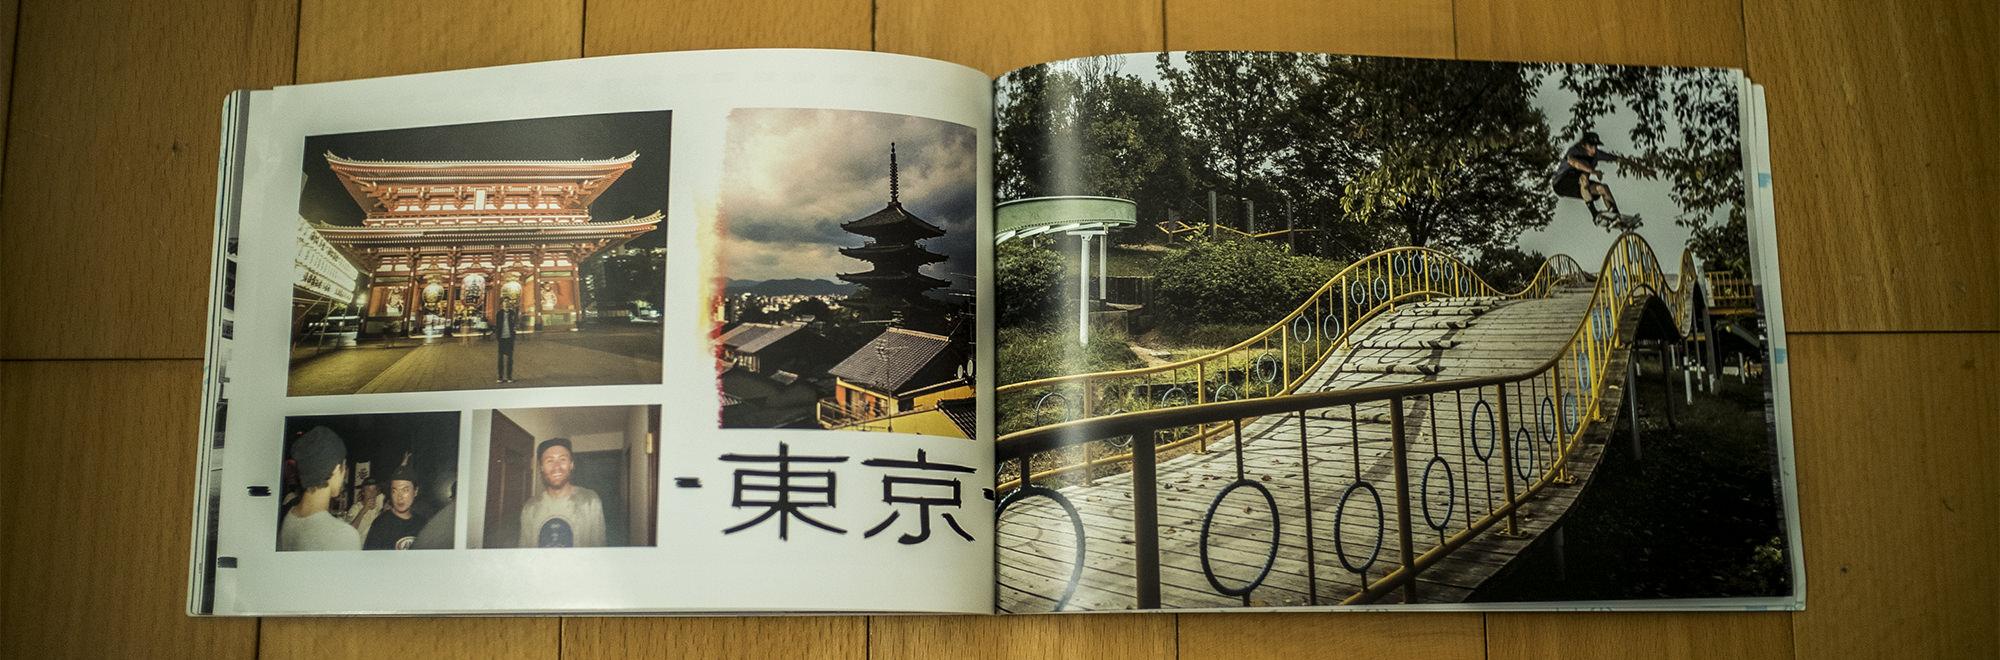 Old Friend Japan Page 16 LOWQ